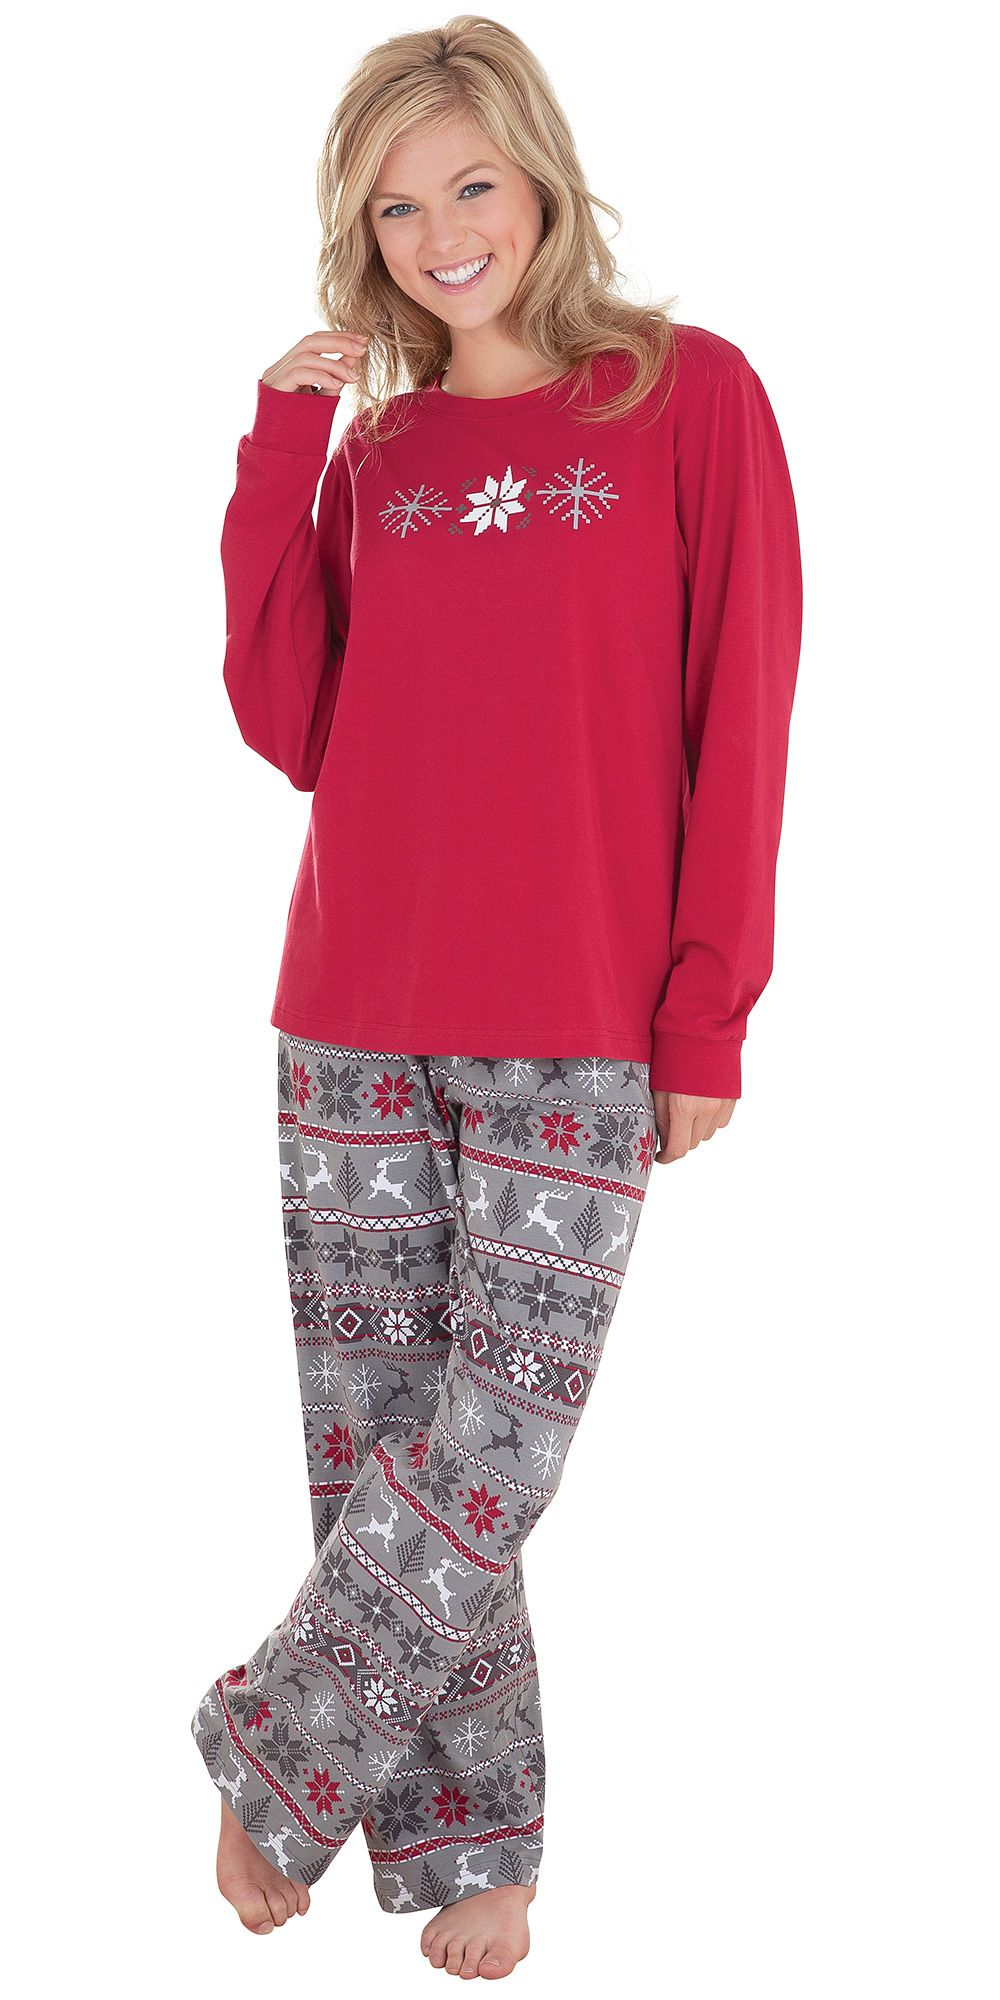 PajamaMania Women's Fleece Pajama PJ Pants Fleece